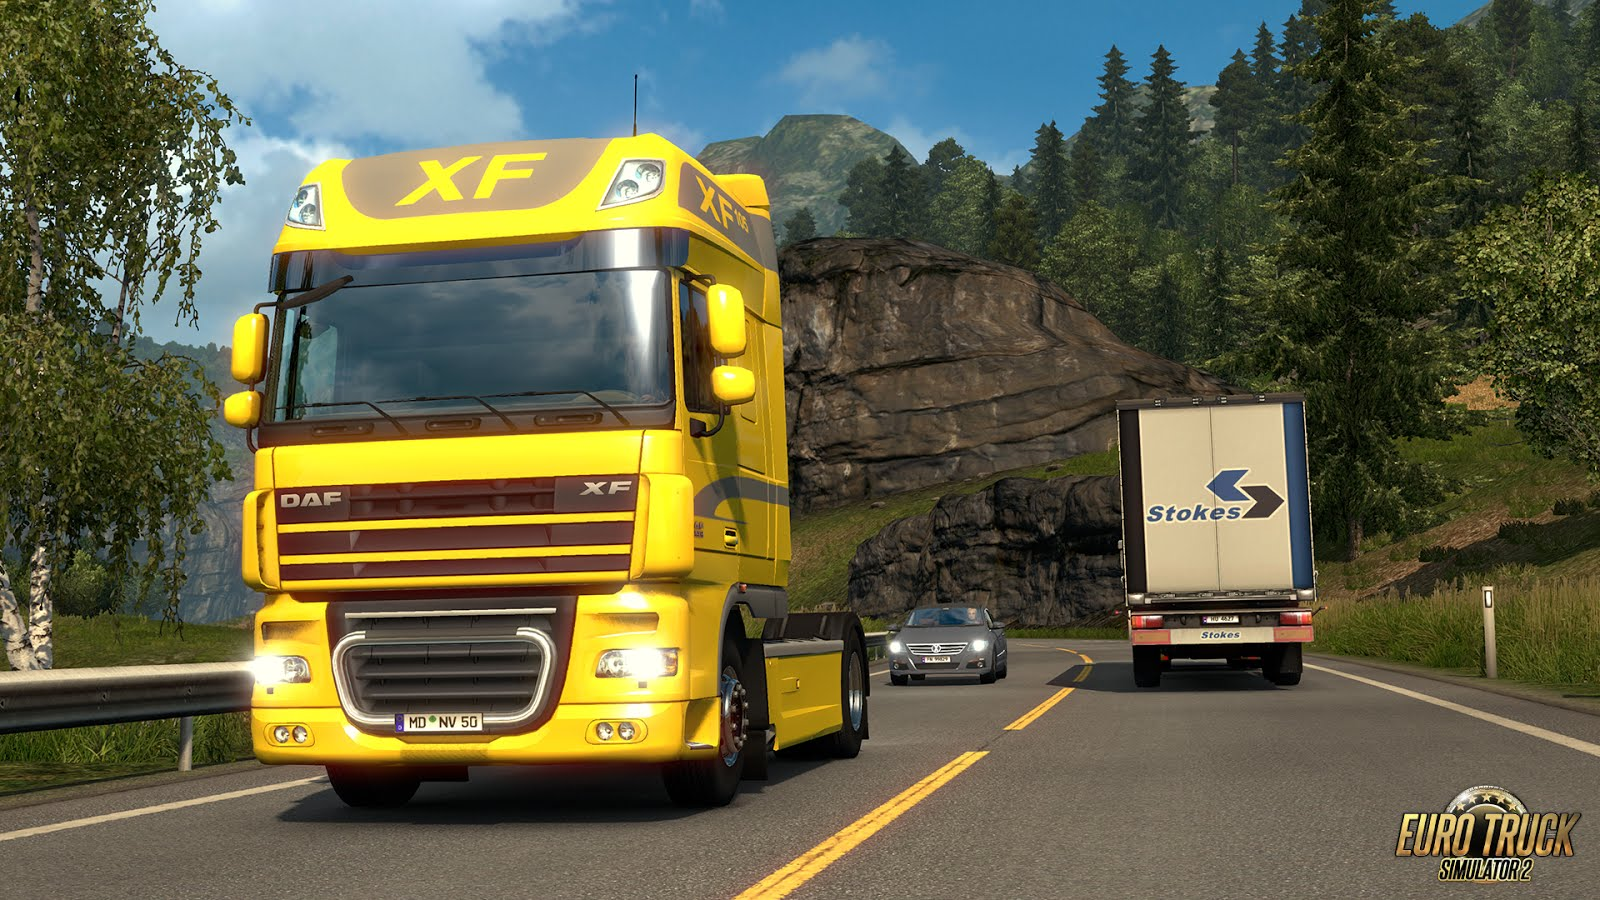 European Truck Simulator: DAF XF 105 Update | RaceDepartment